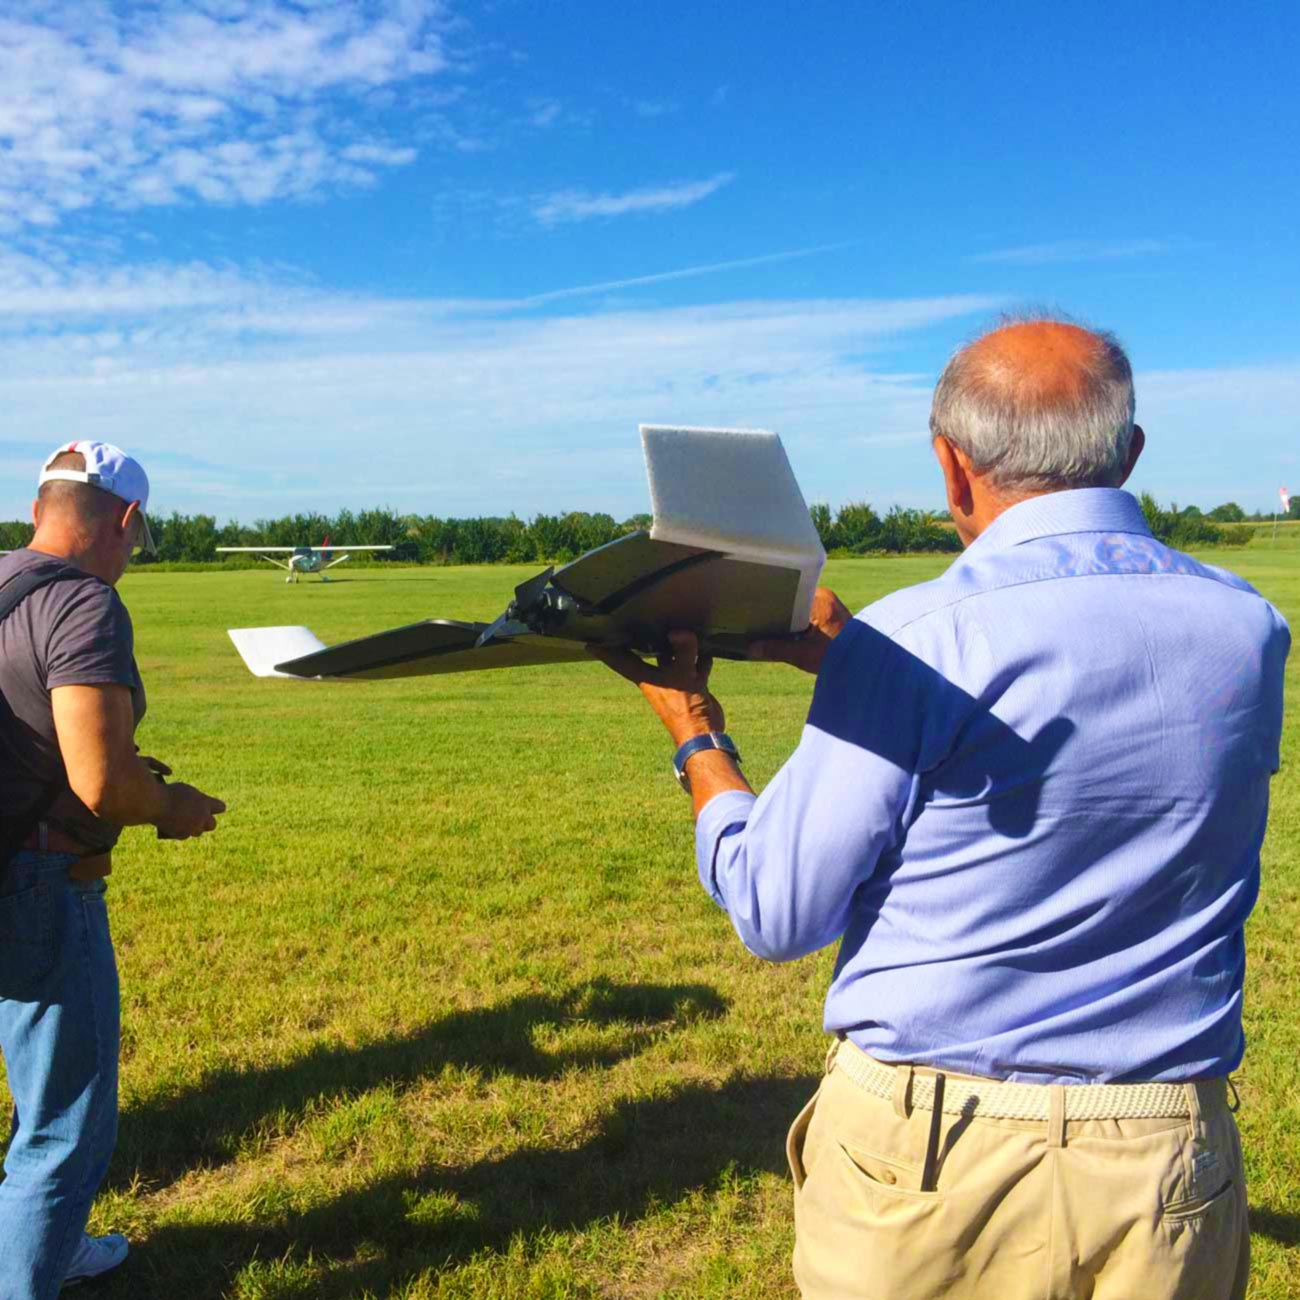 decollo-parrot-disco-pro-ag-drone-agricoltura